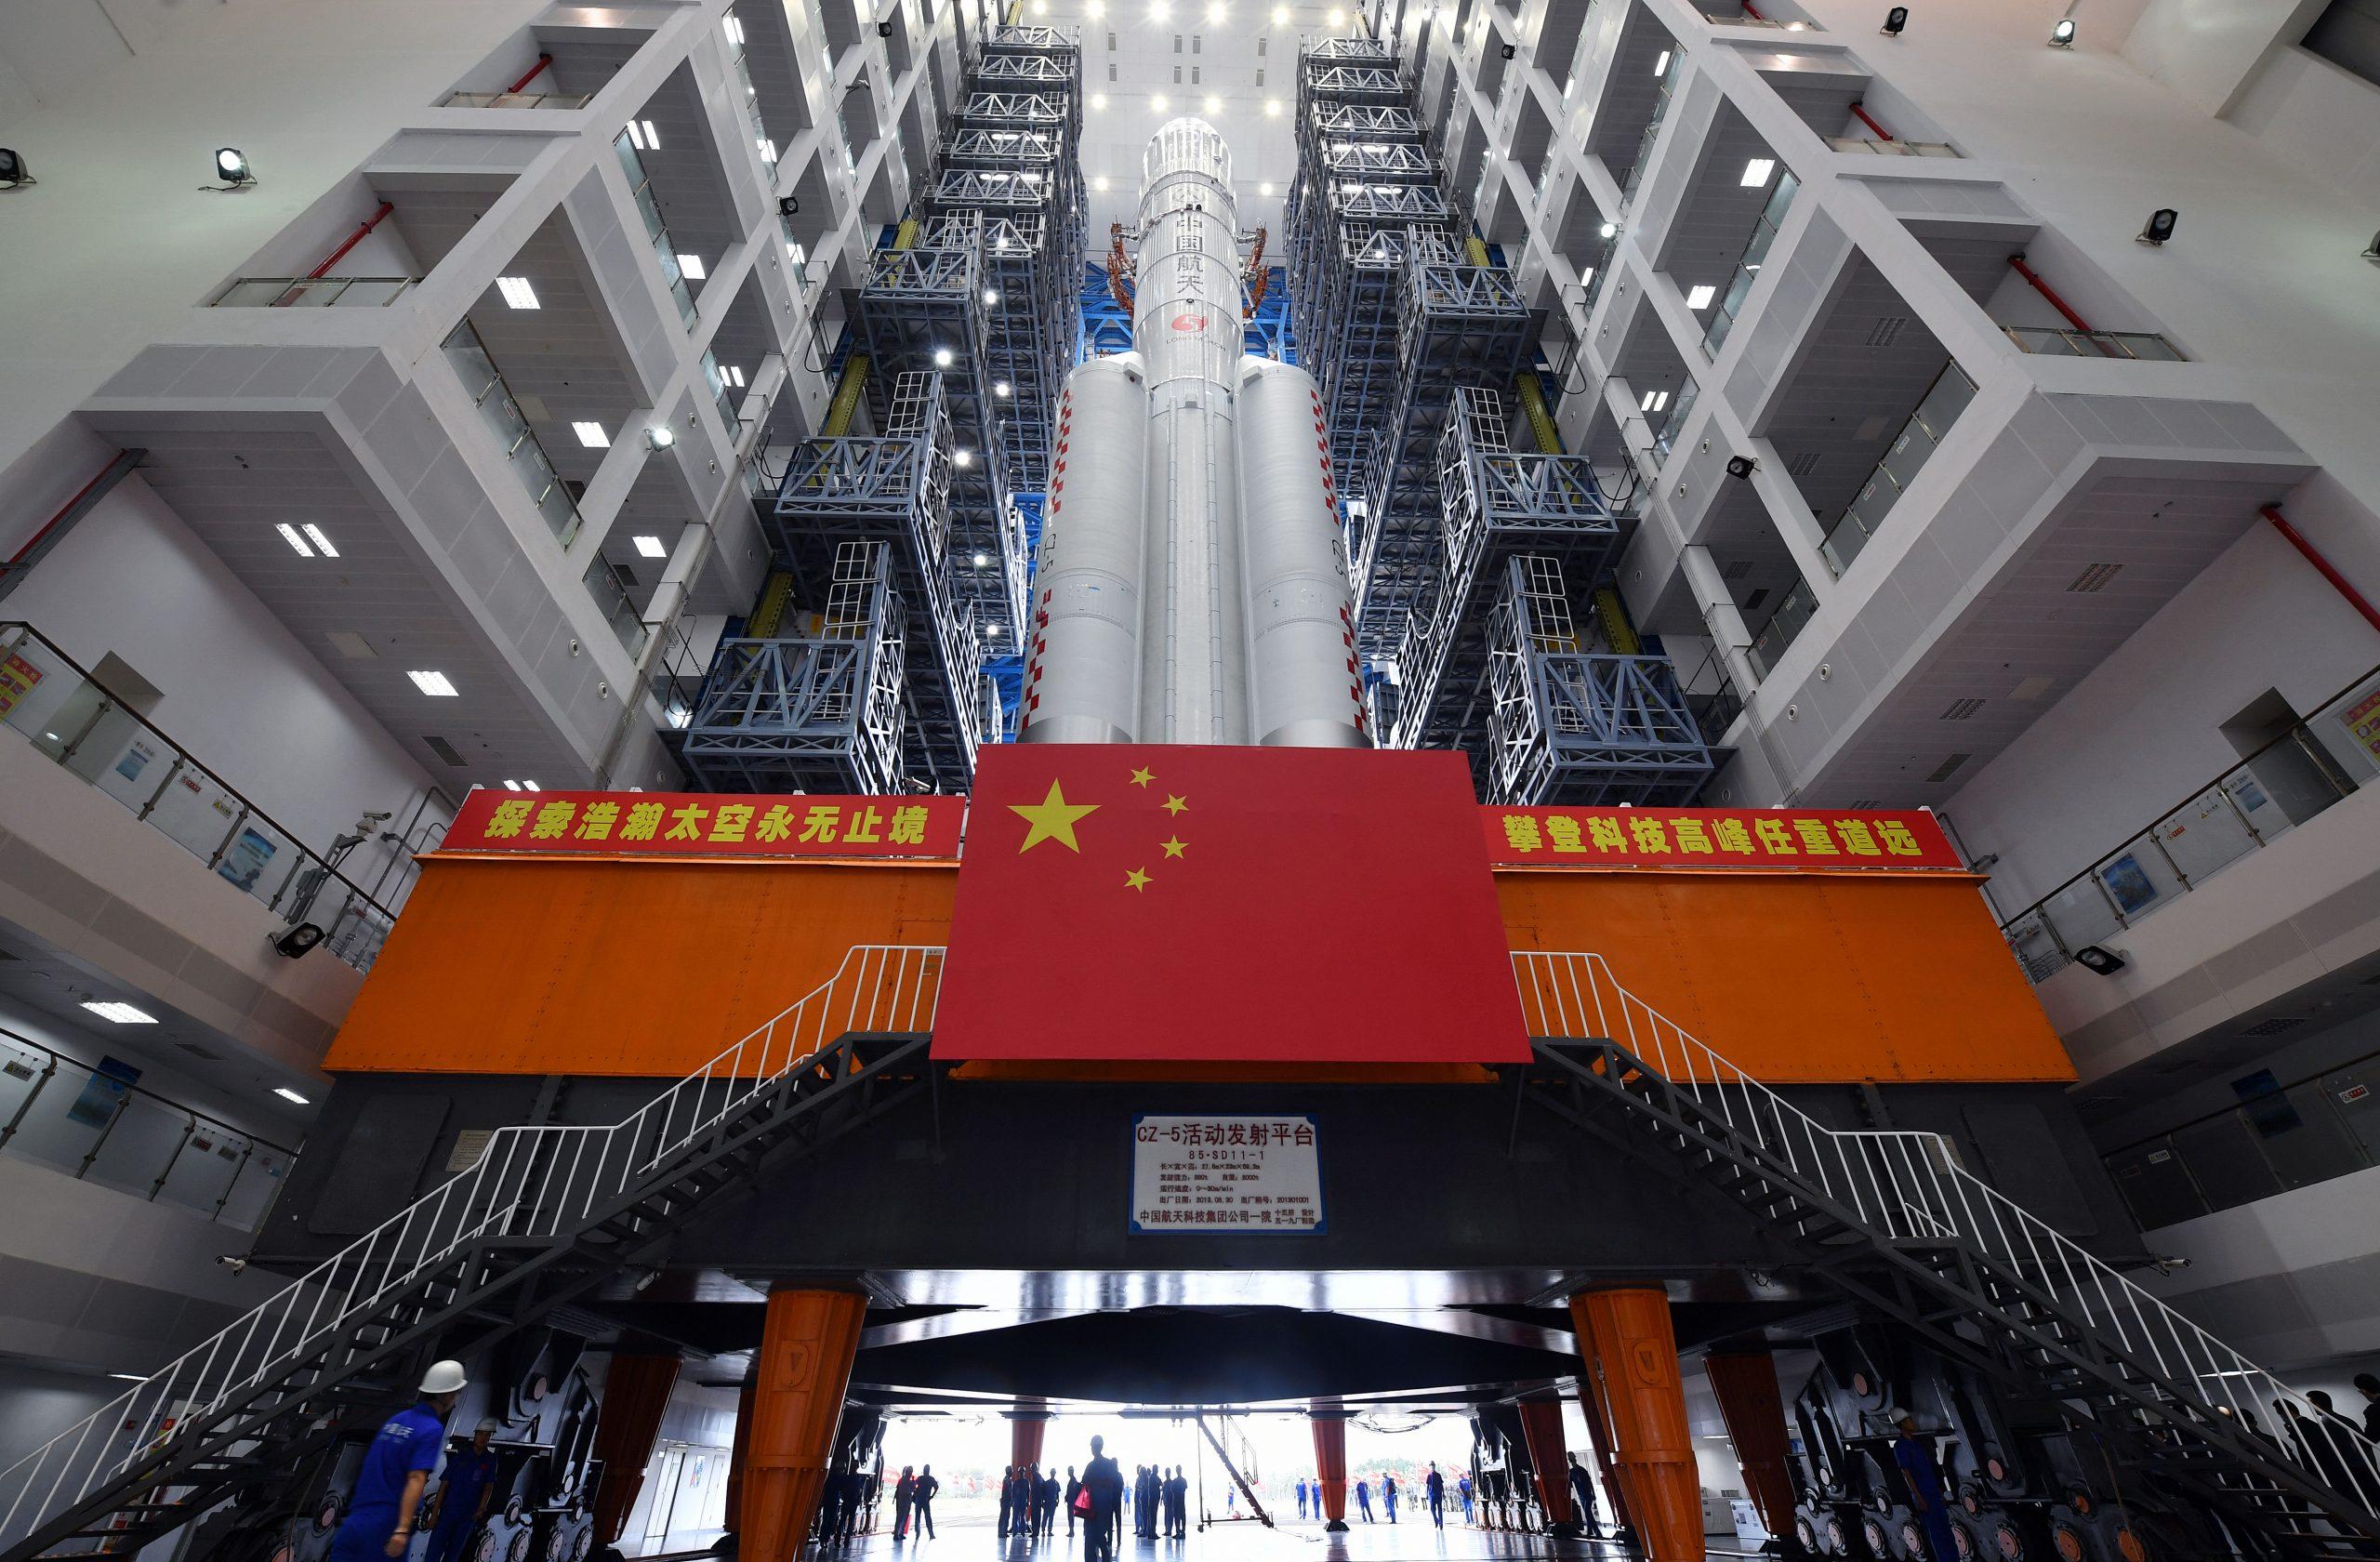 Cohete Gran Marcha-5 de China cargado con combustible propulsor para lanzamiento